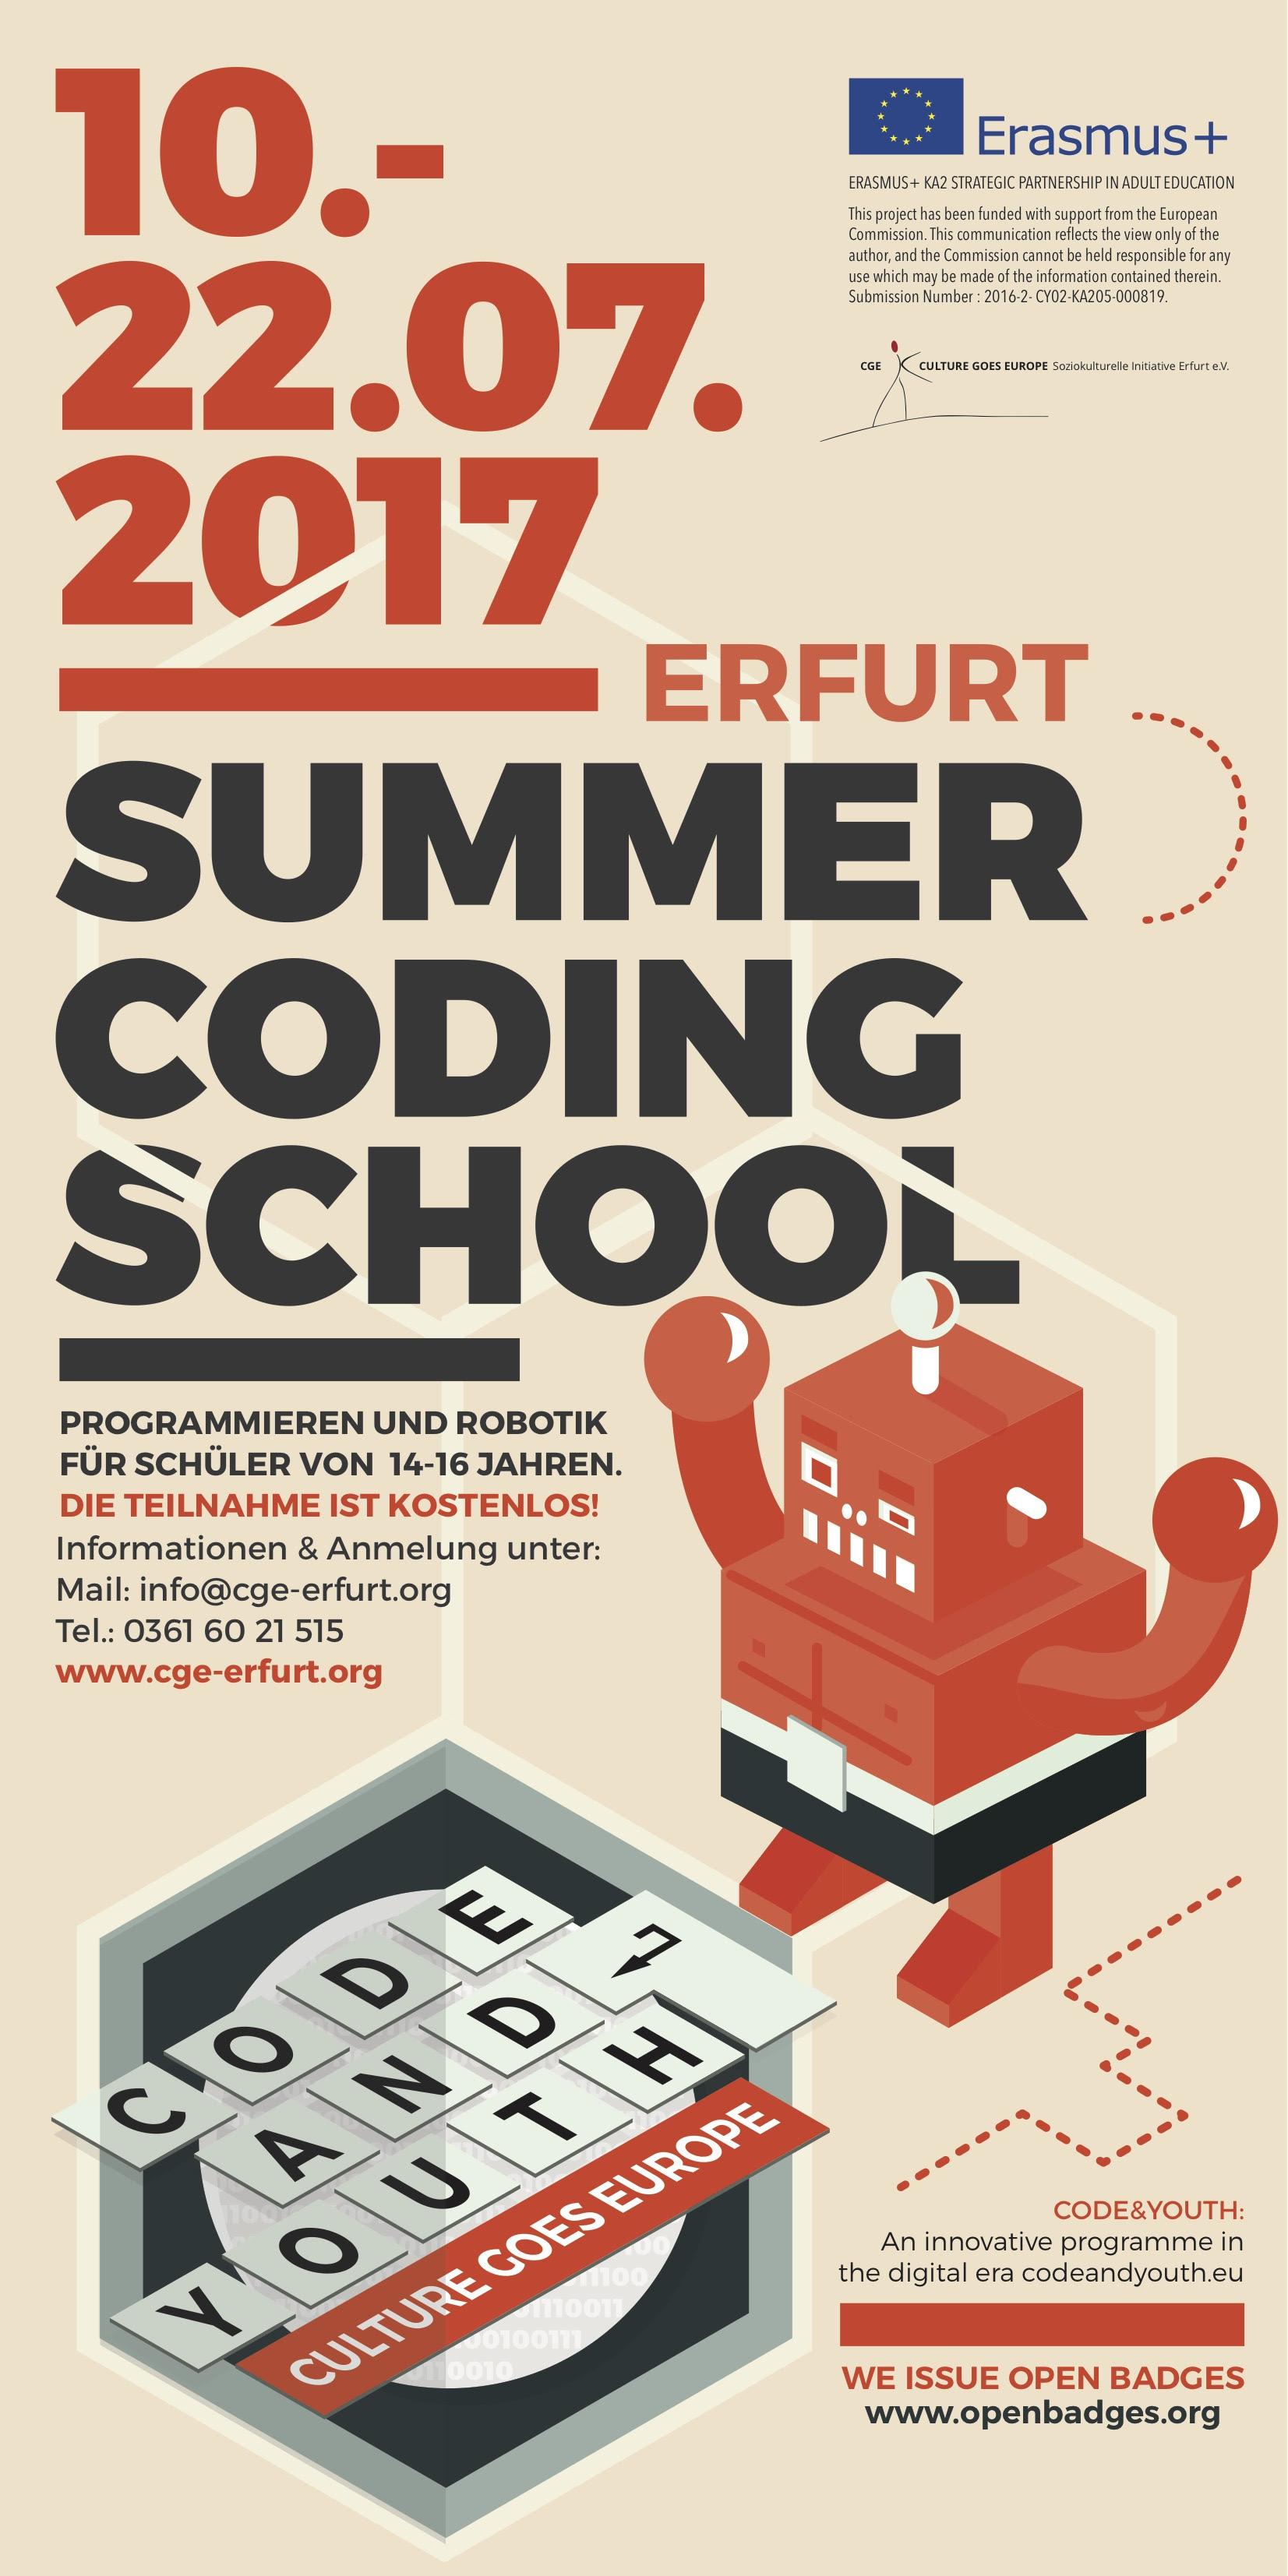 Germany Summer School Code And Youth - anime roblox music codes check description #U0441#U043c#U043e#U0442#U0440#U0435#U0442#U044c